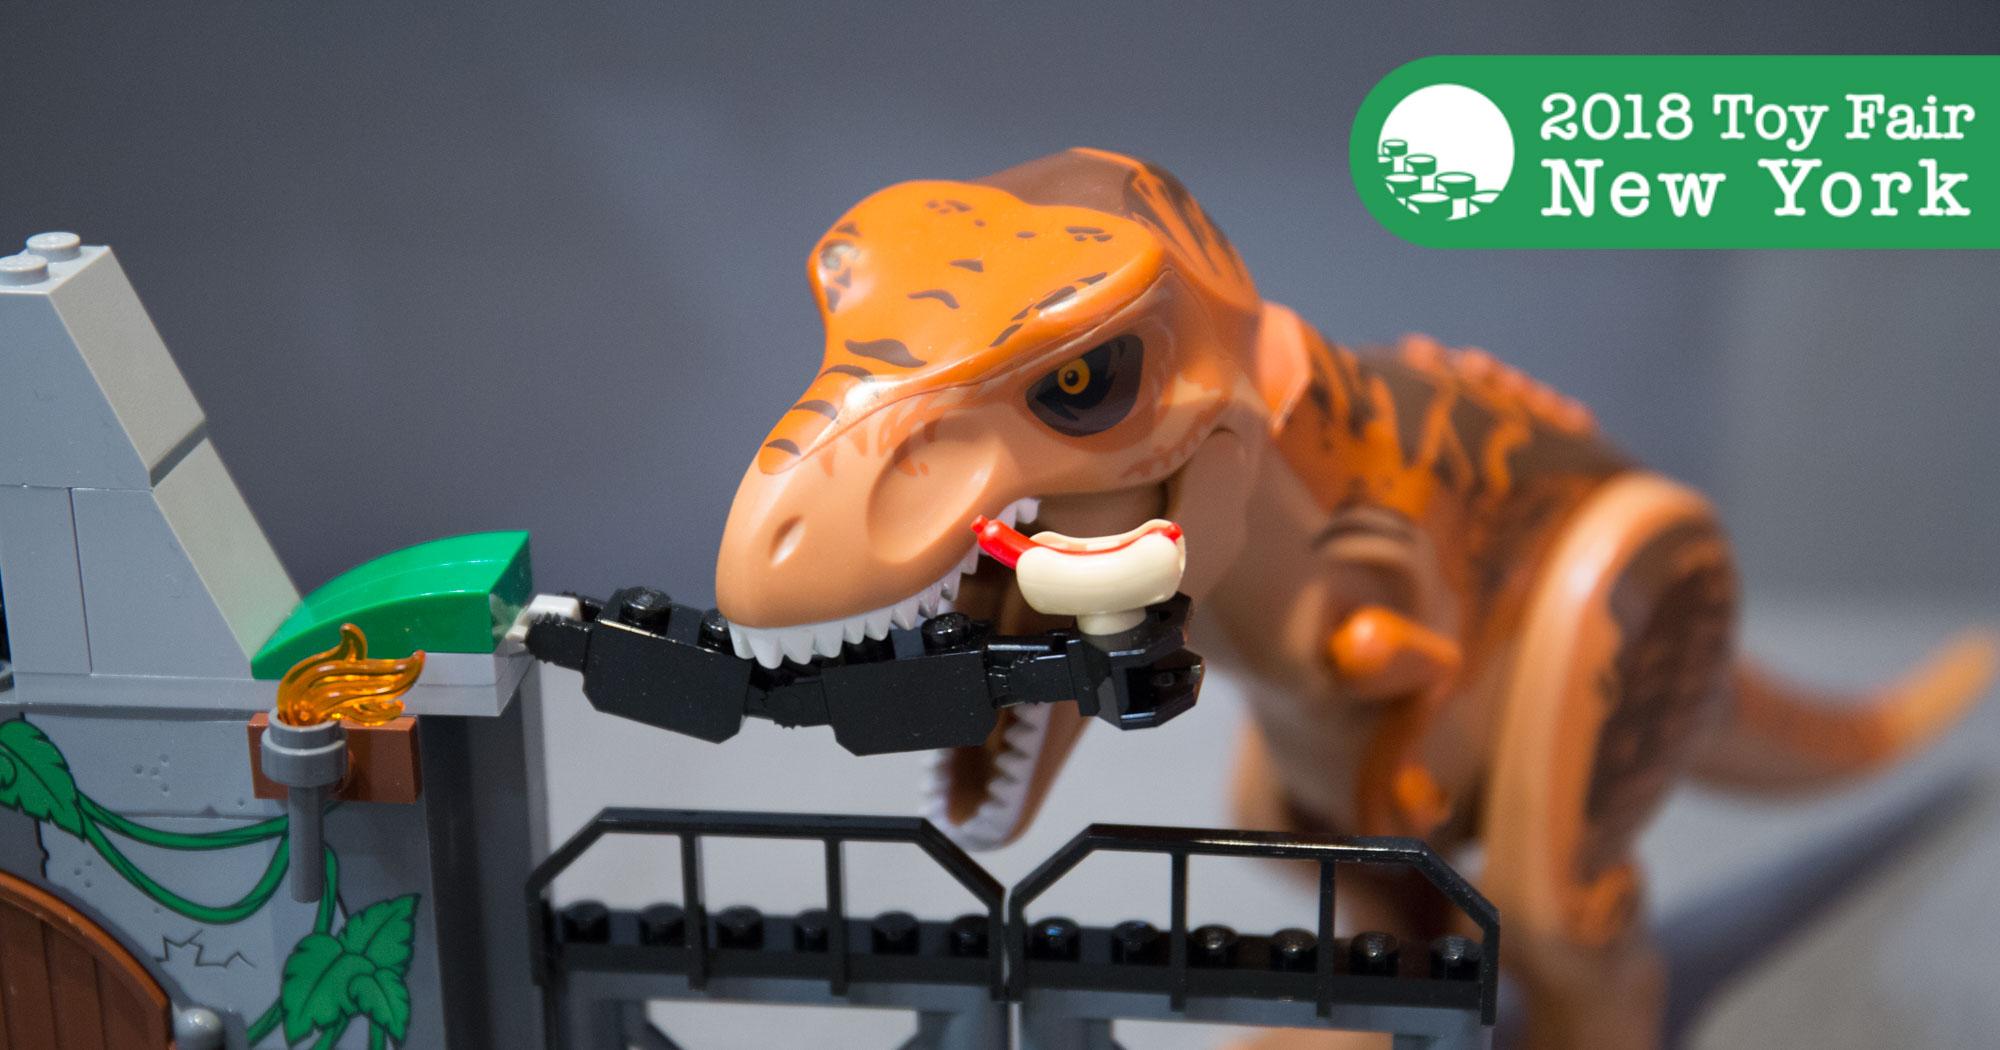 Lego Jurassic World Fallen Kingdom Sets At New York Toy